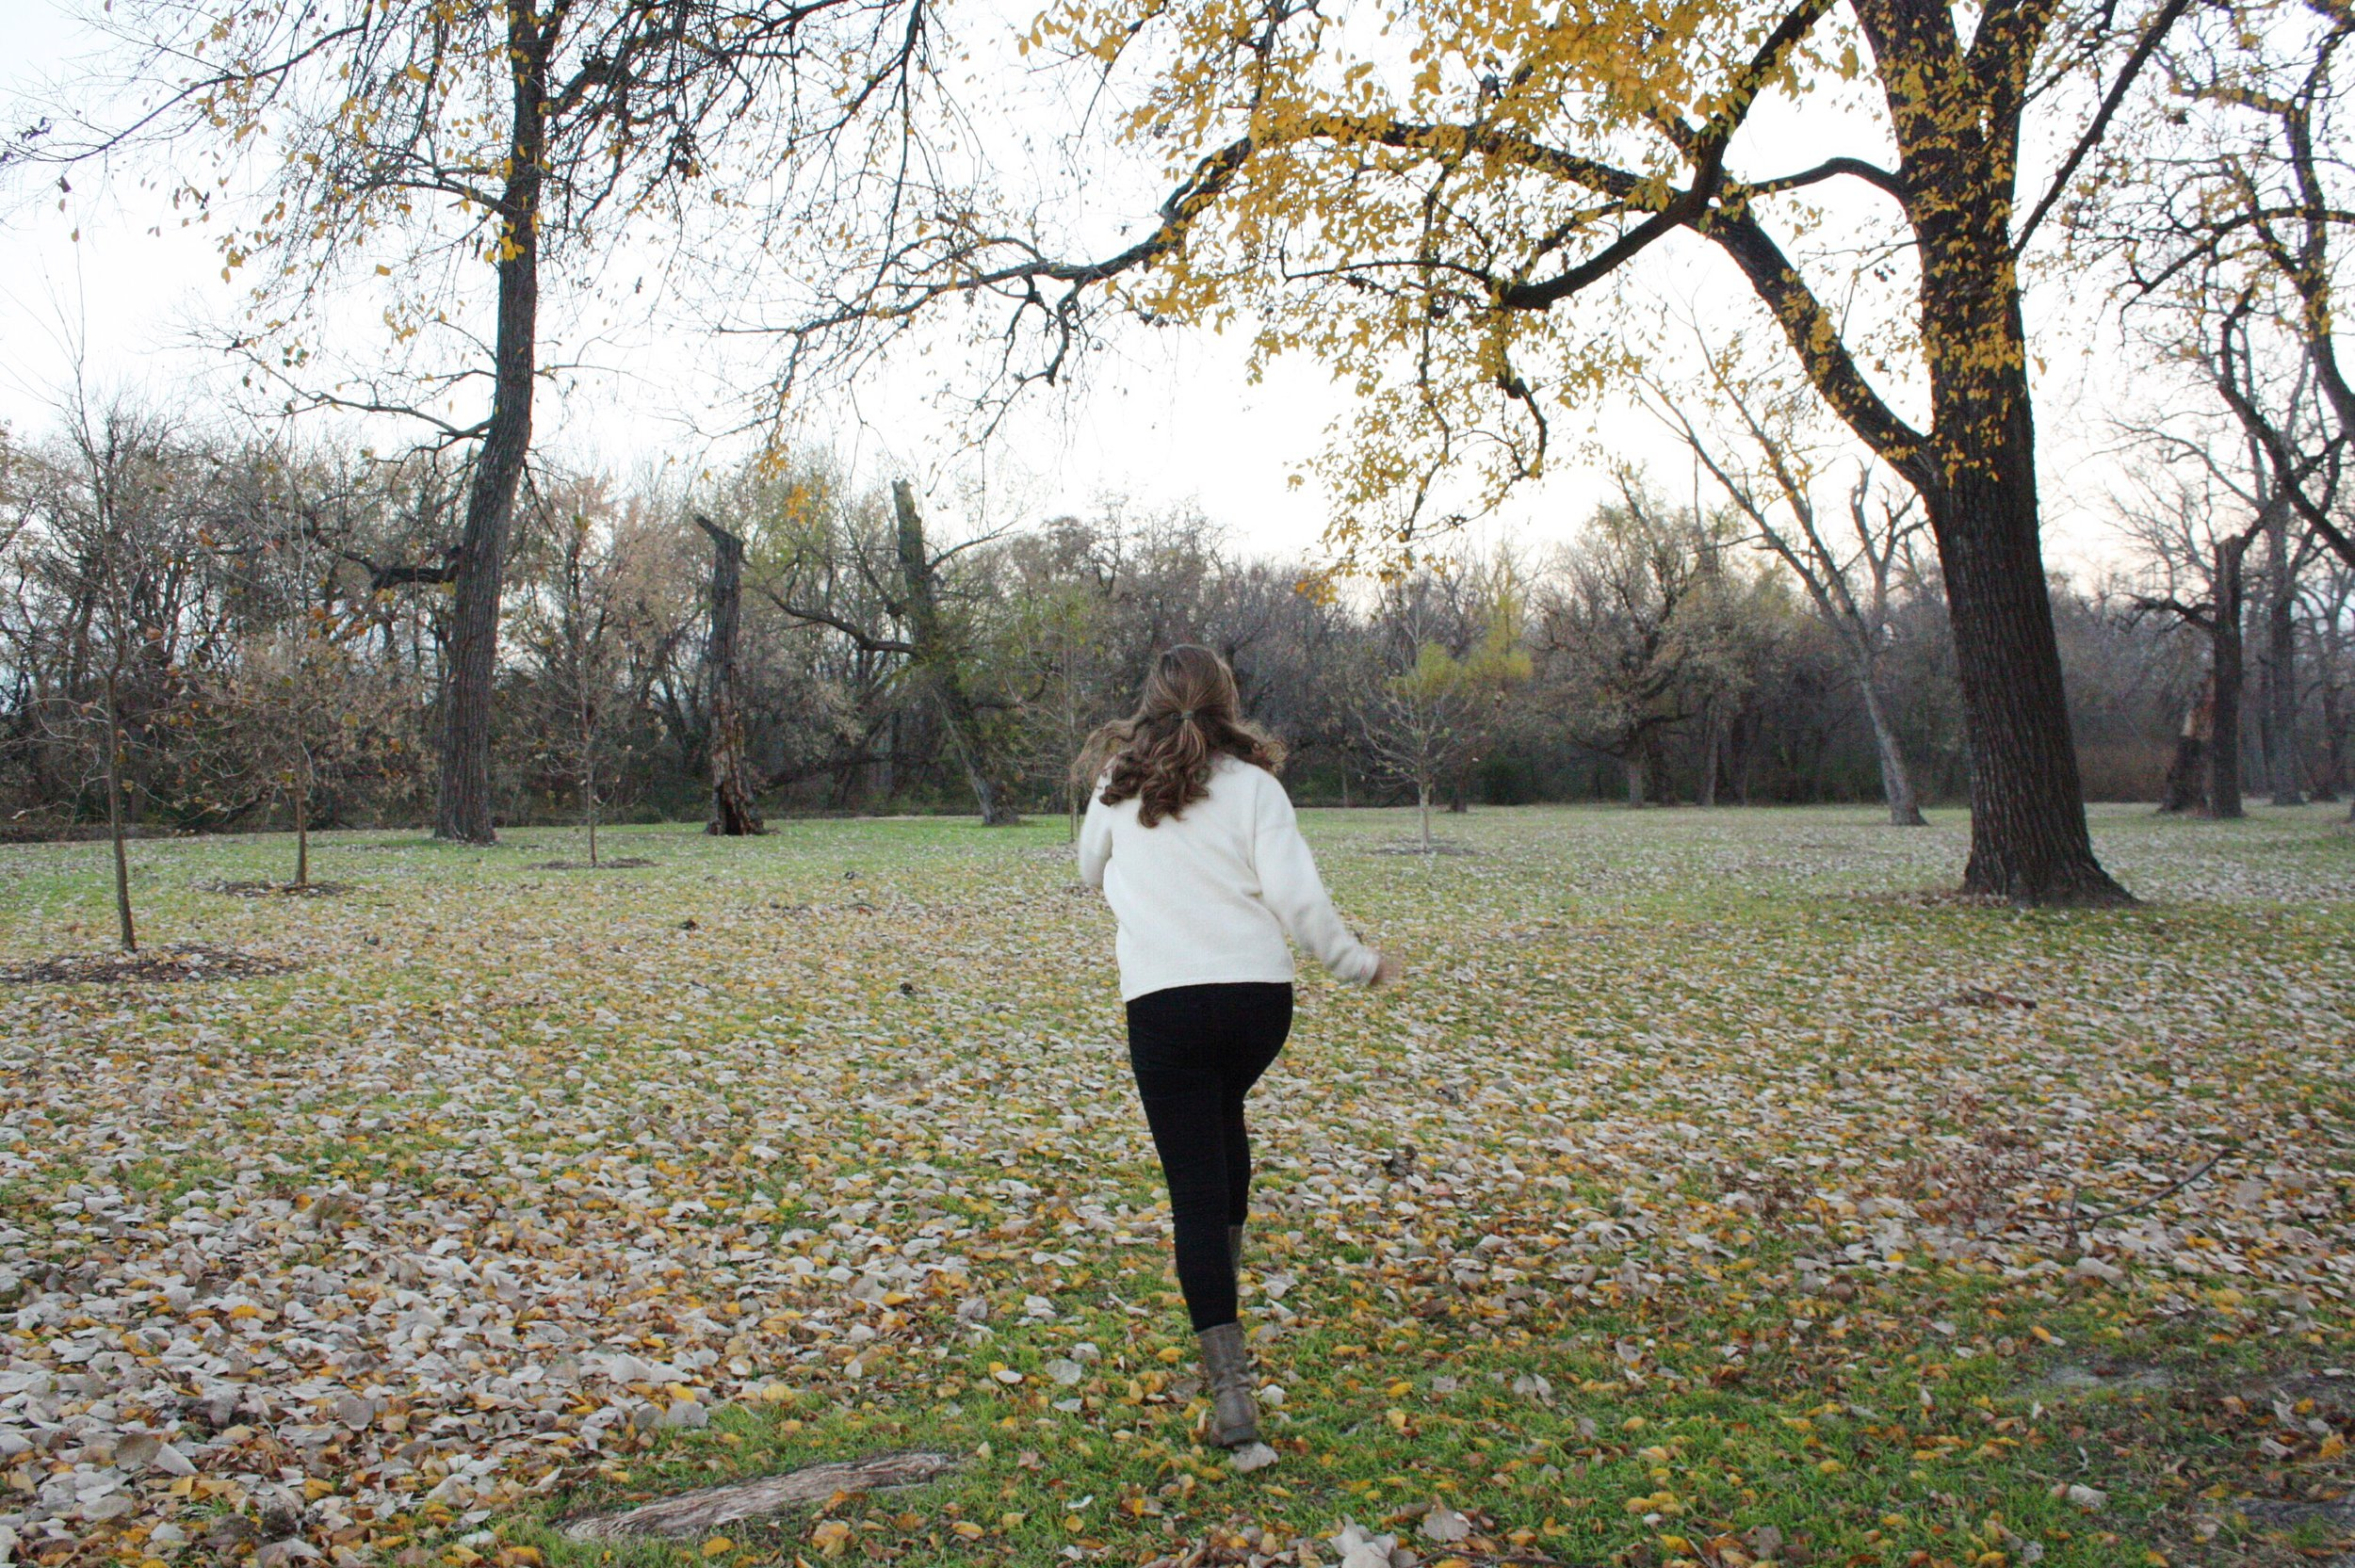 My sister Vivian, in Dallas, Texas (November 2014)